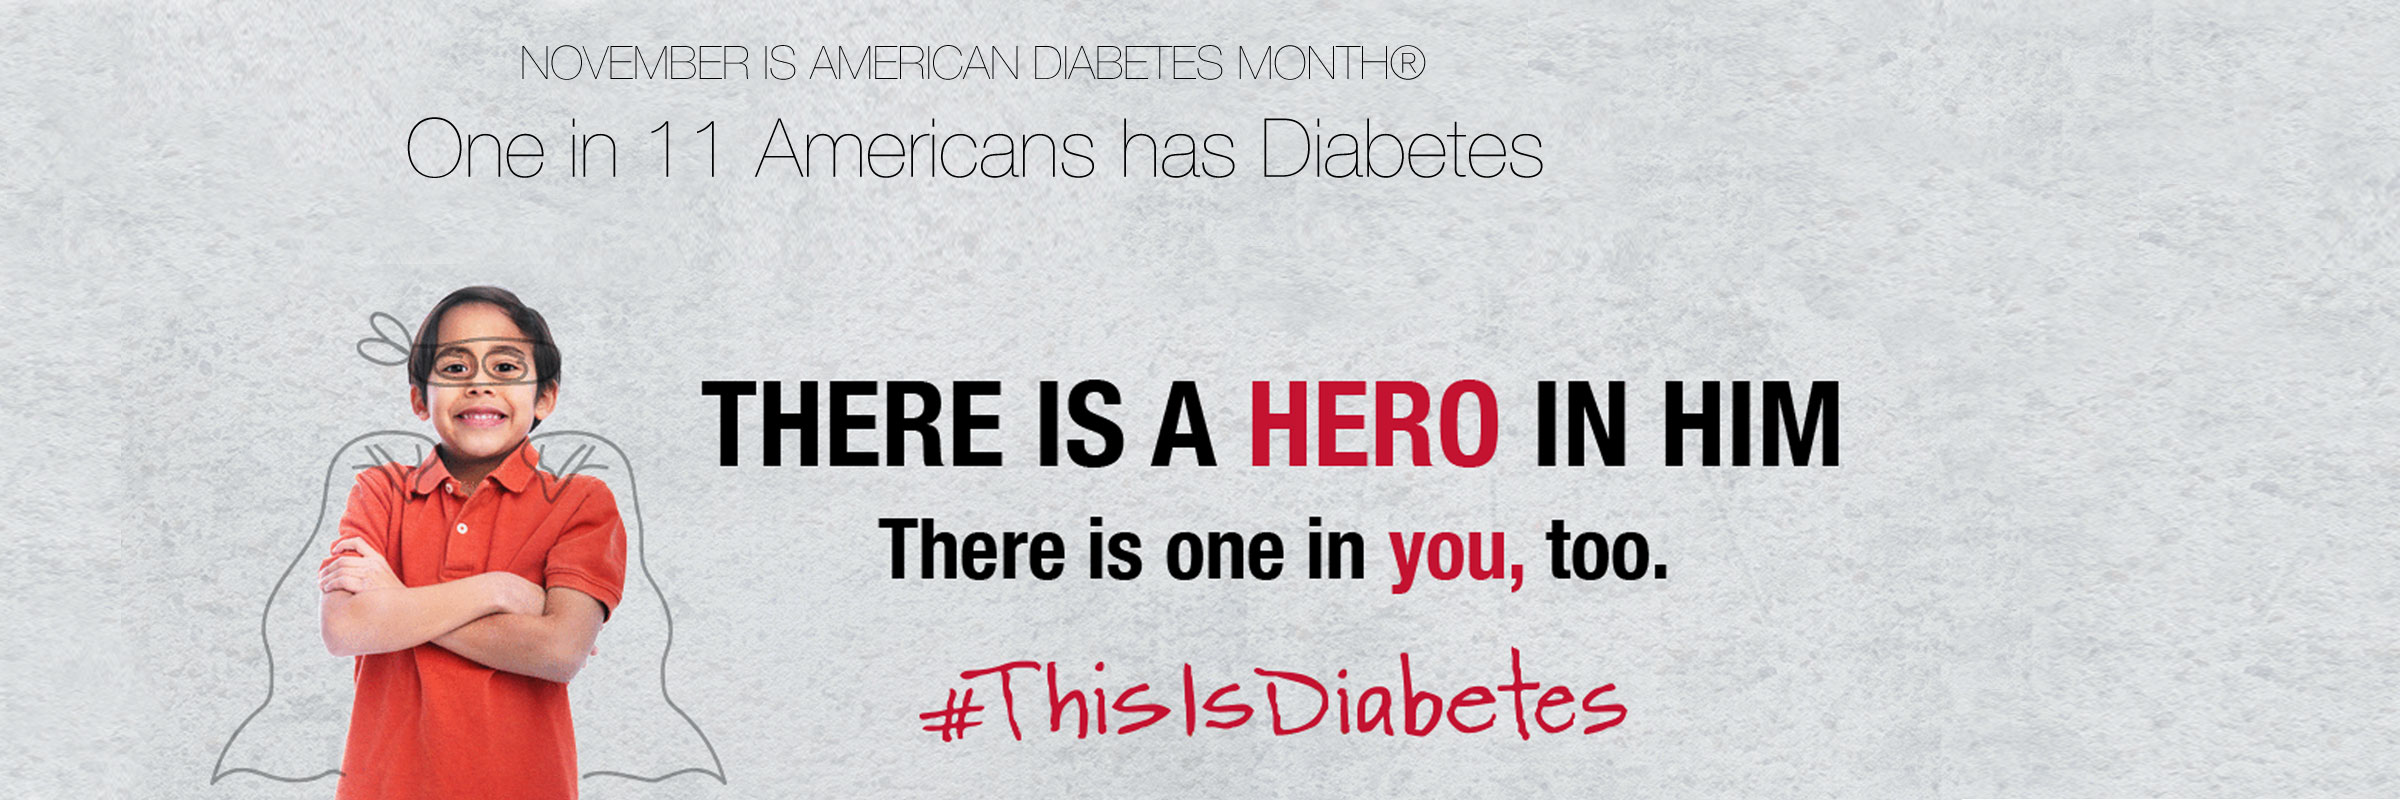 11-diabetes